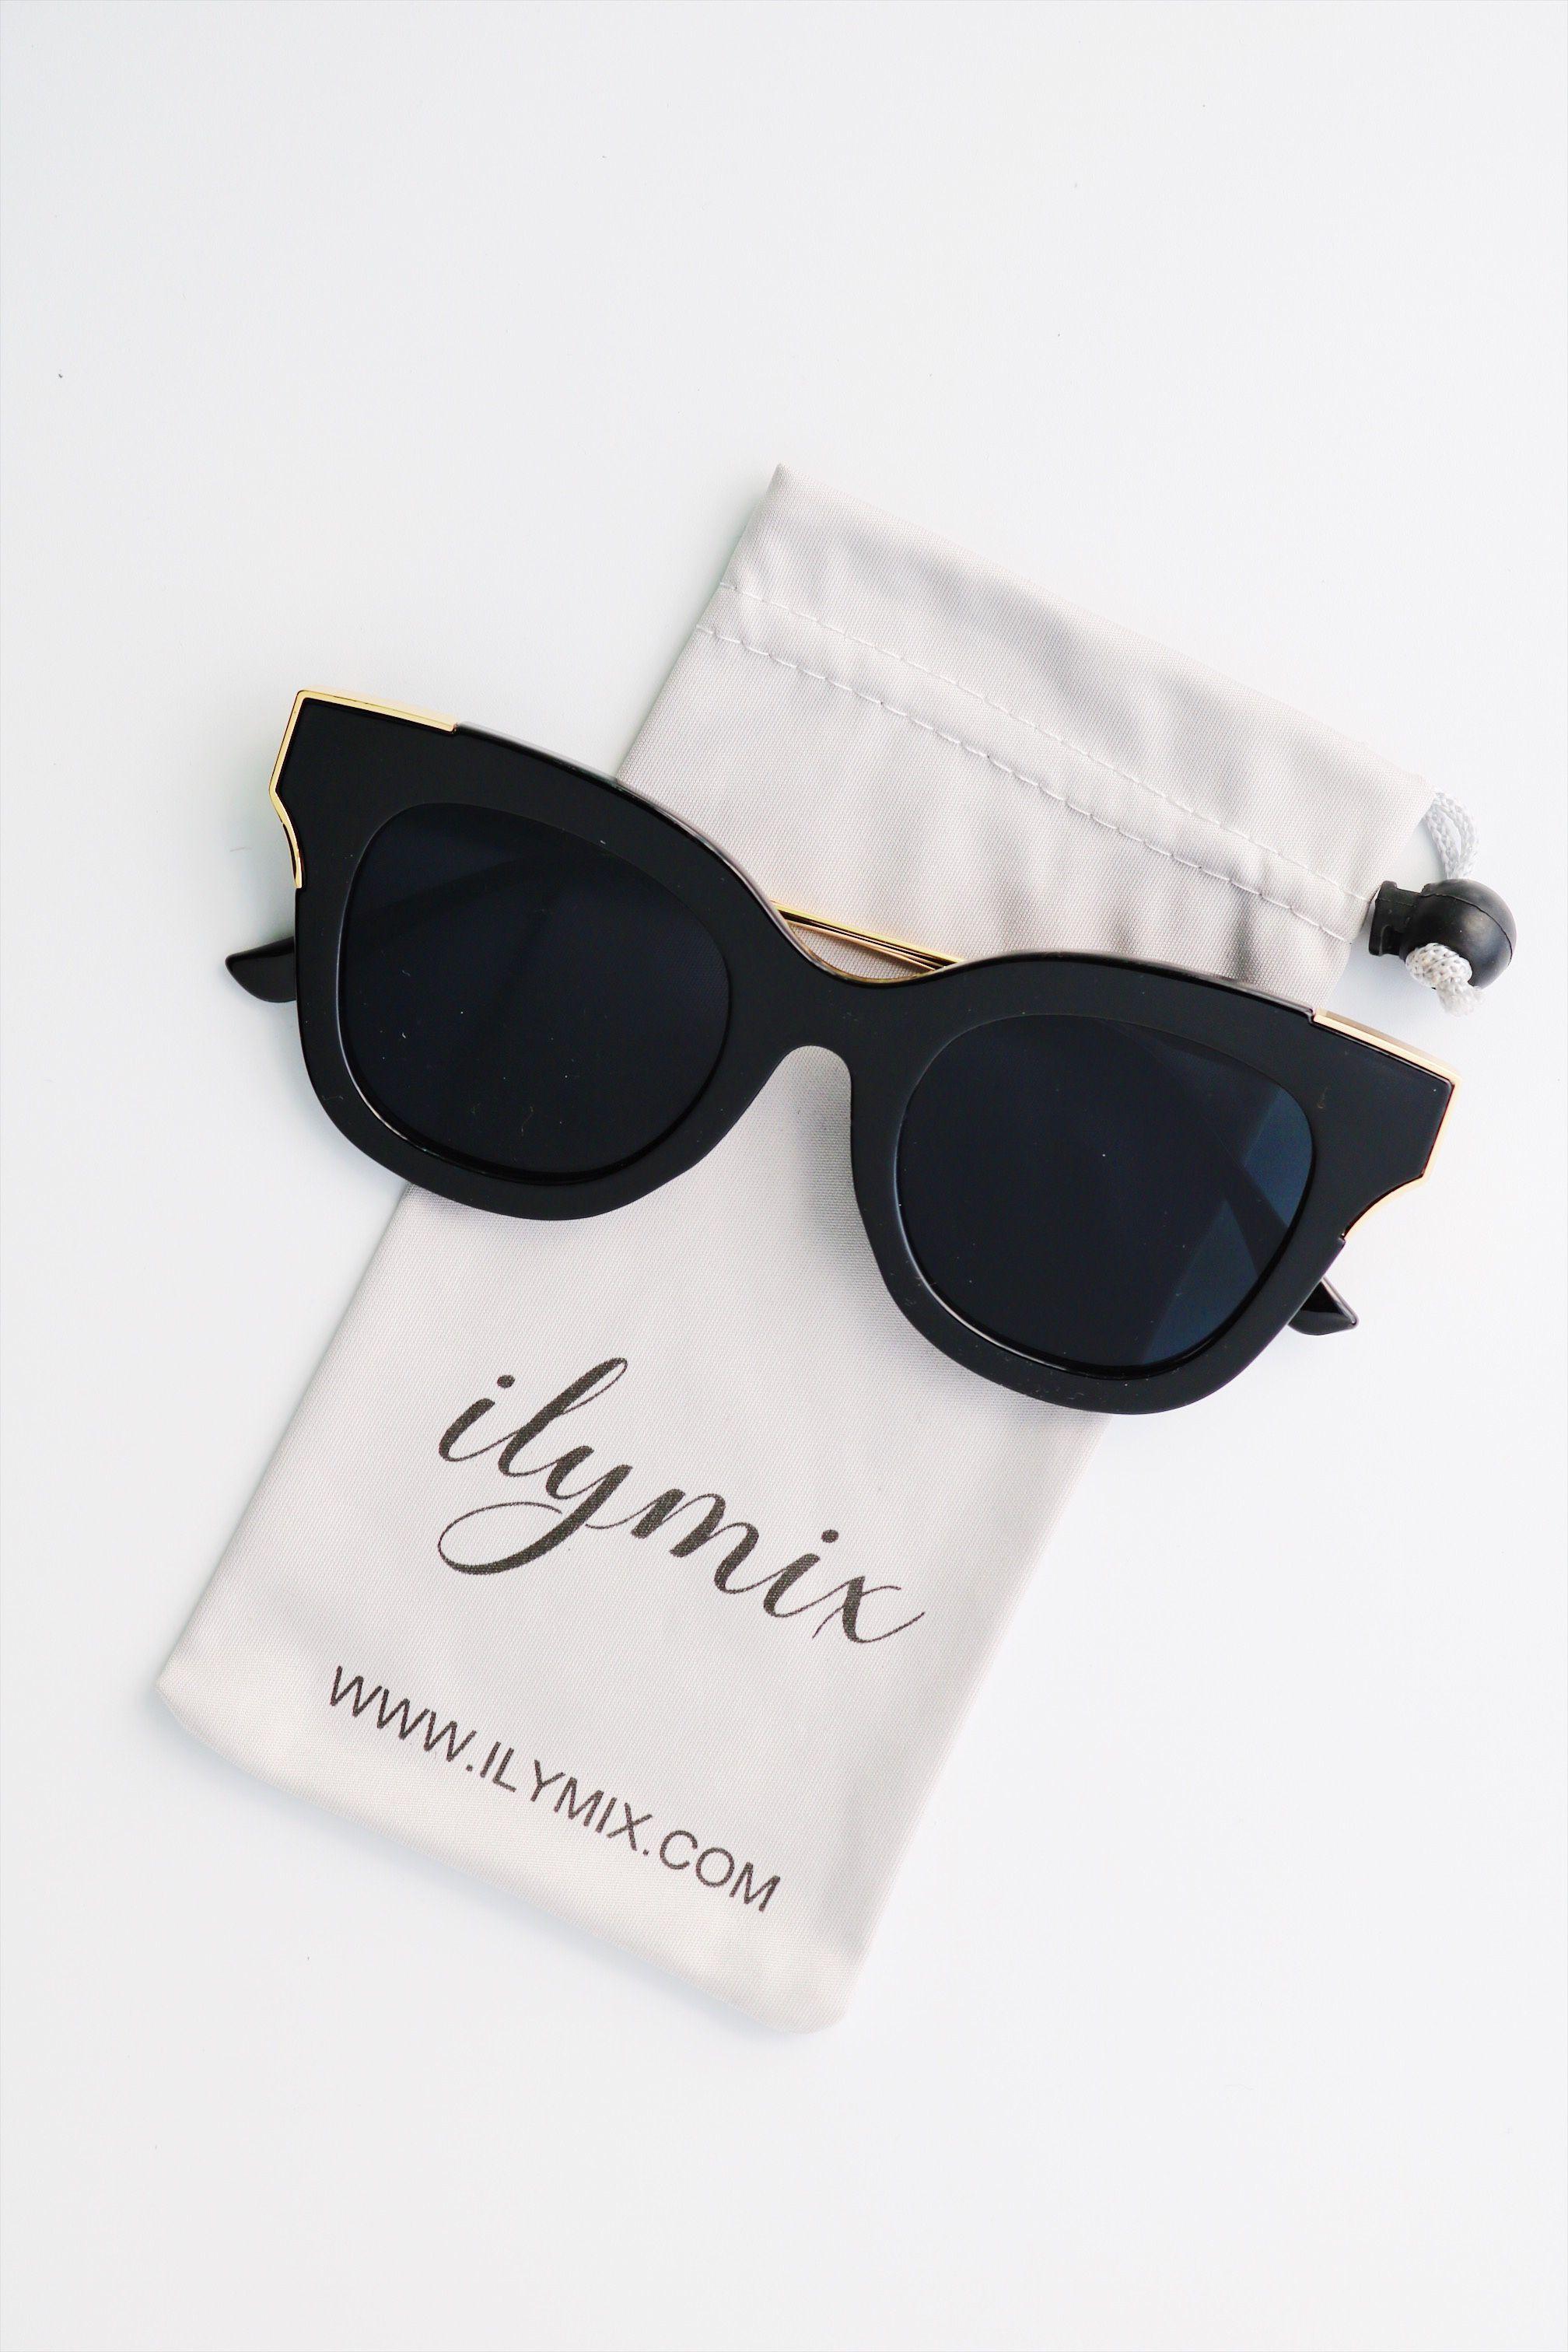 bc9fd95f5ffee Designer sunglasses women mirror shades fashion styles